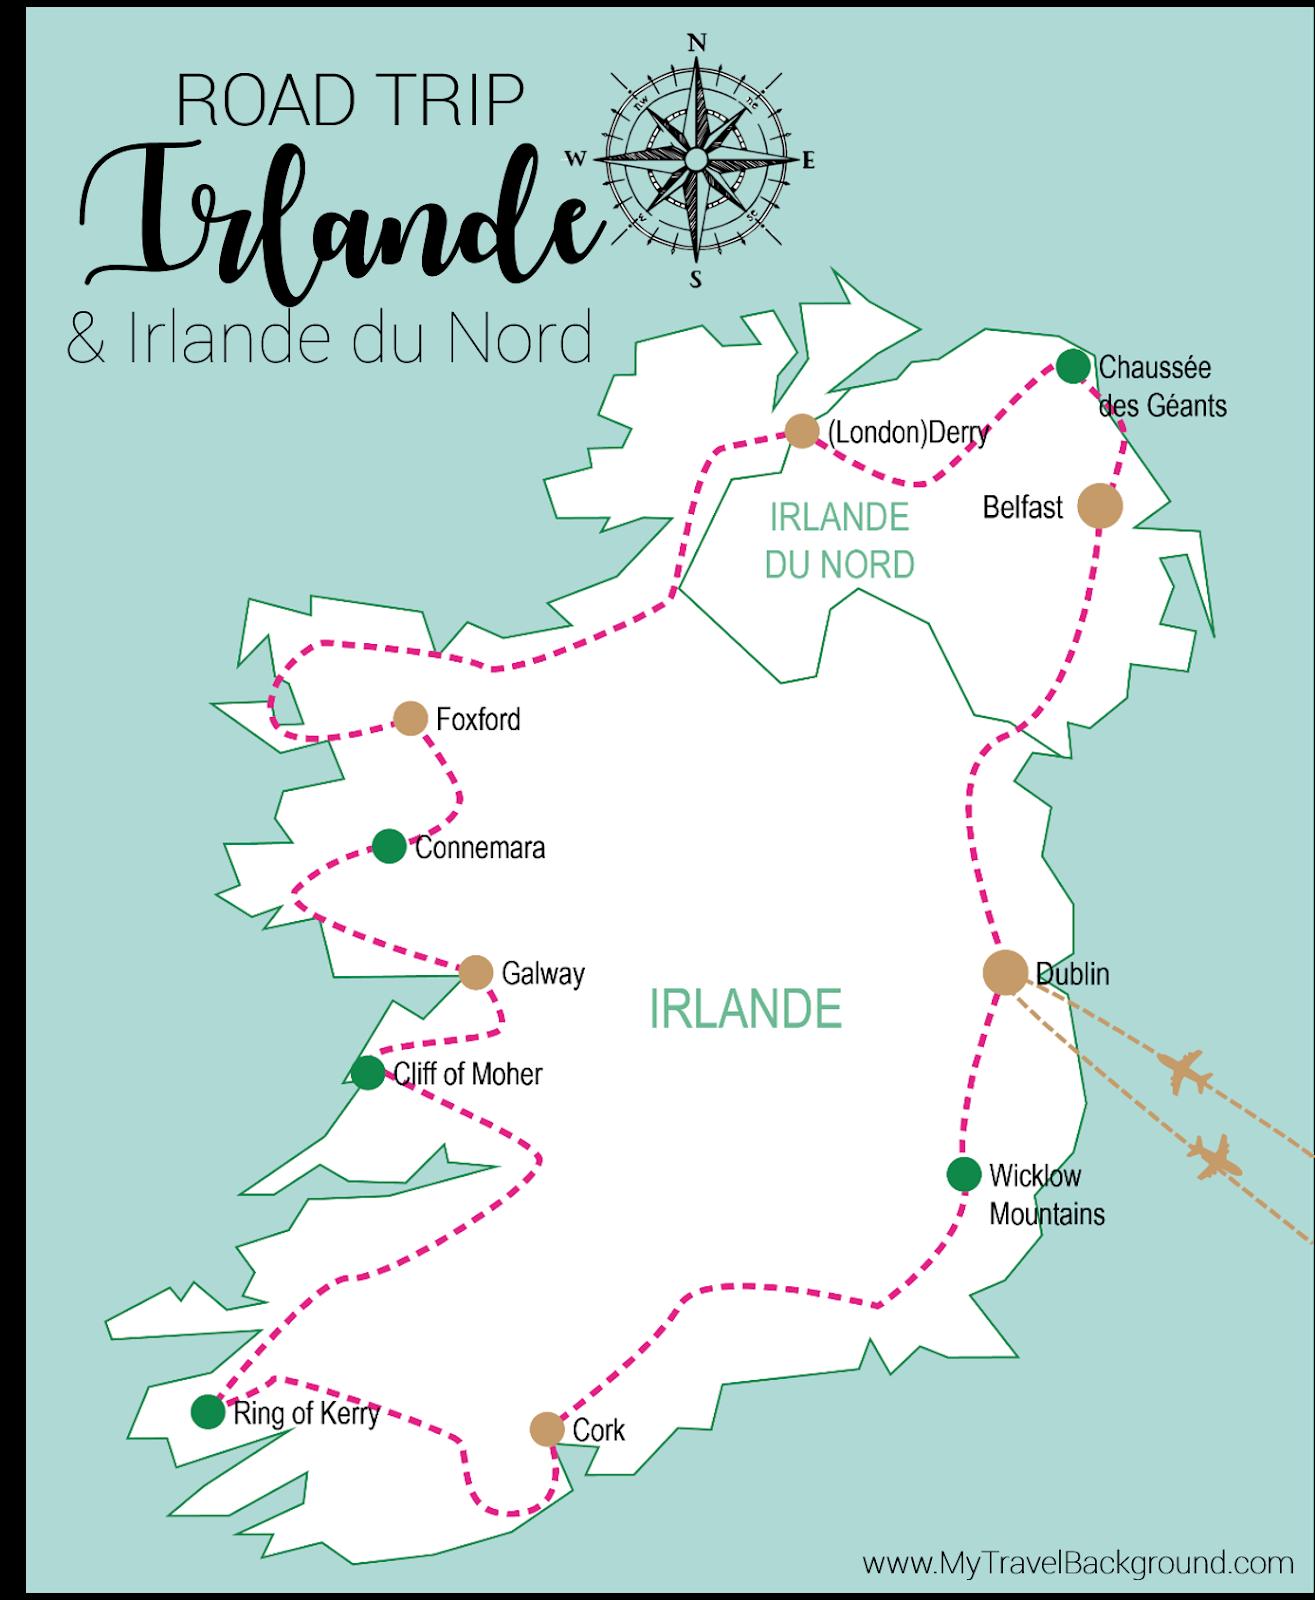 My Travel Background : mon road trip en Irlande et Irlande du Nord - Itinéraire